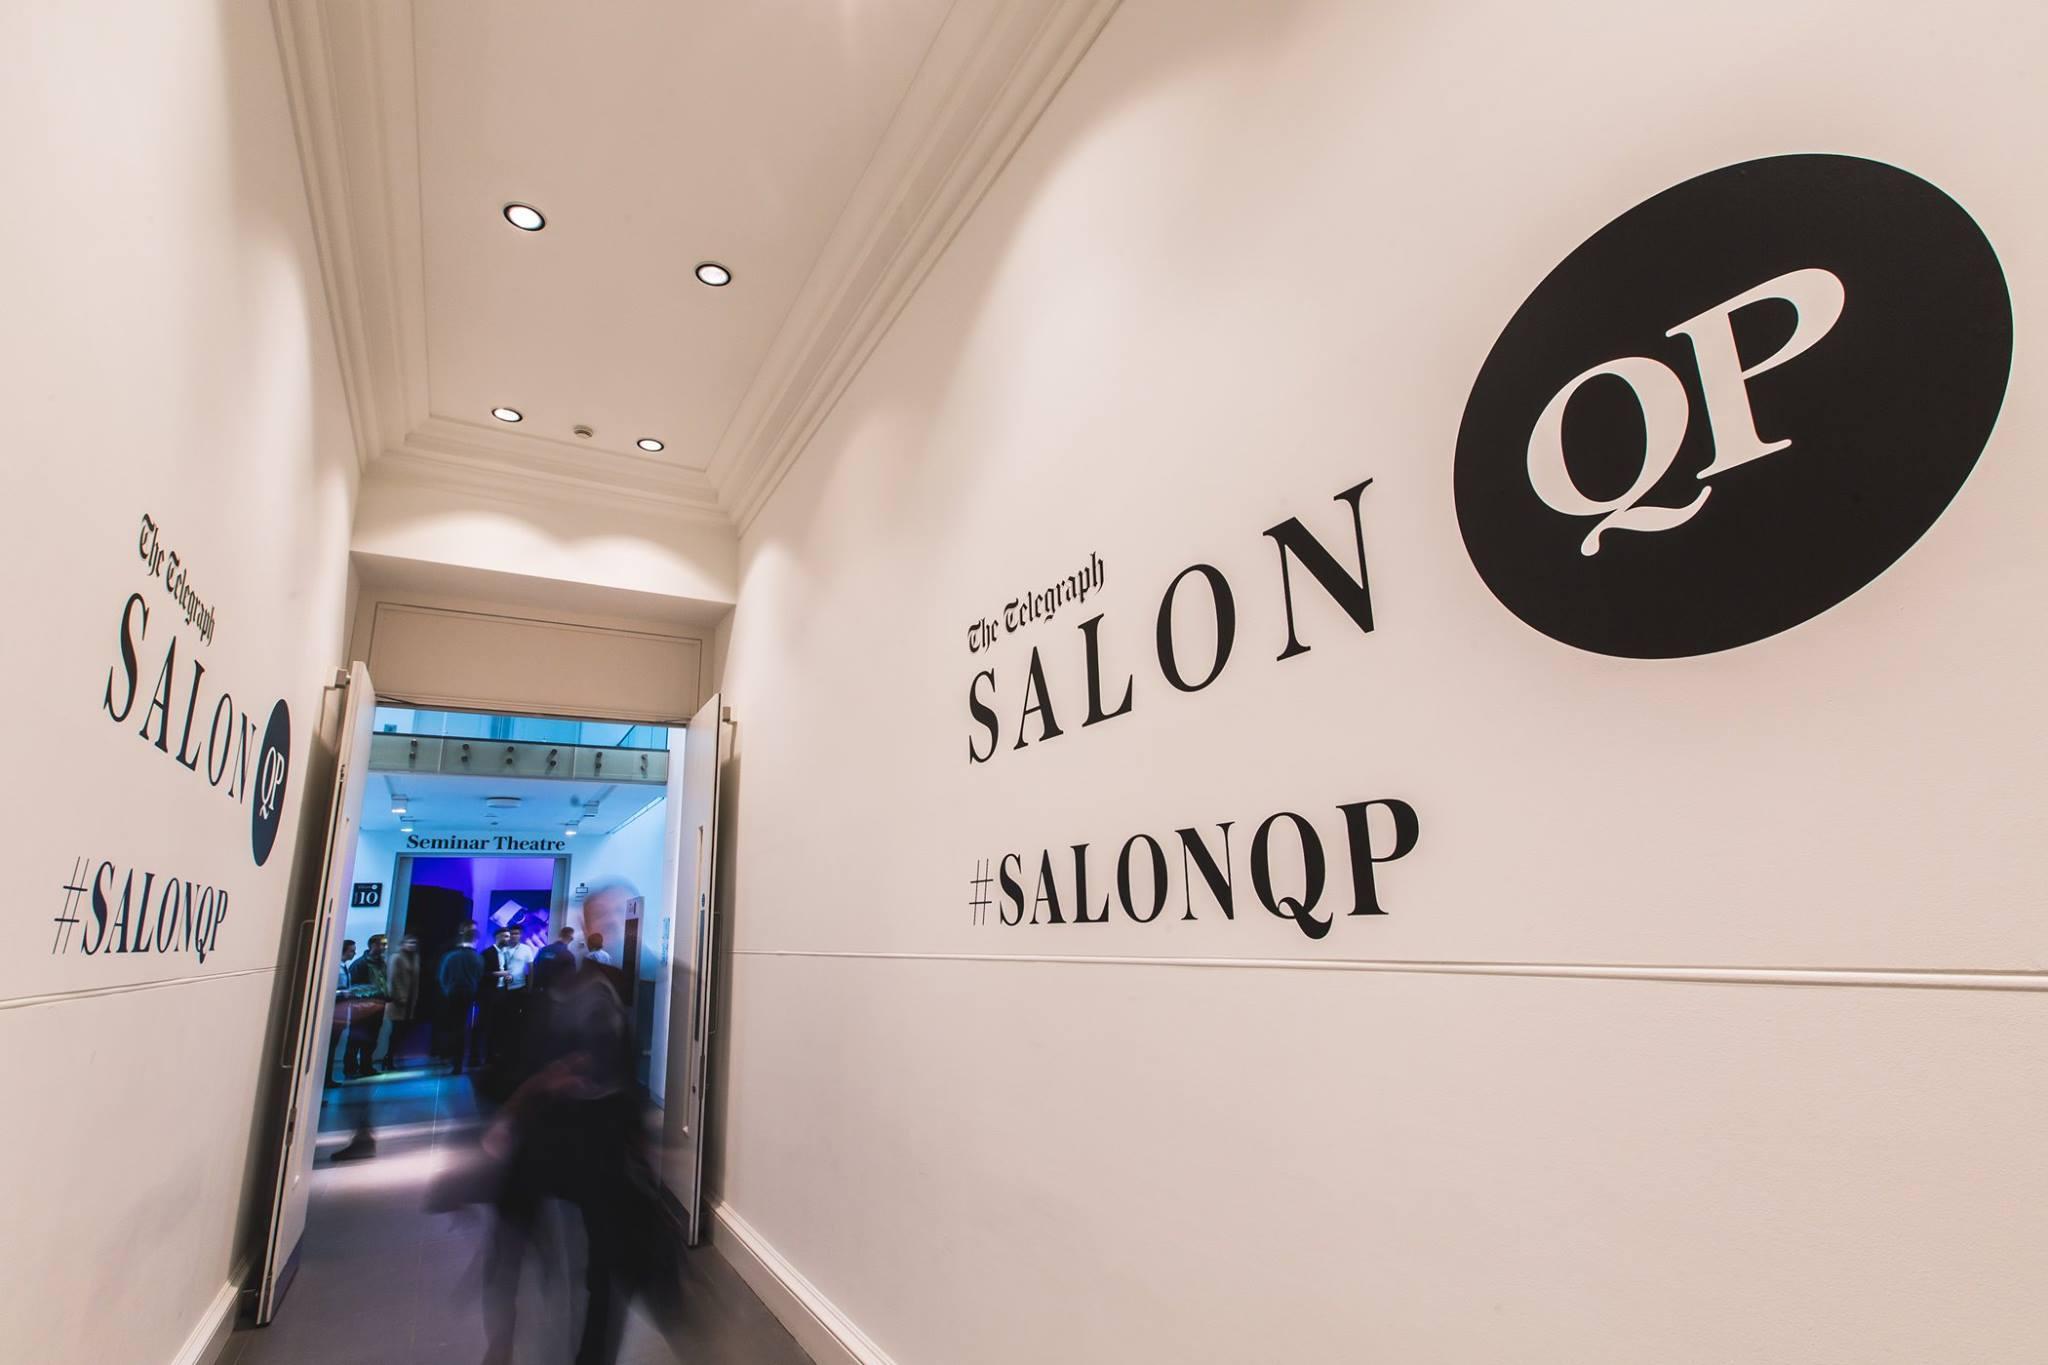 Salon QP 2017 Saatchi Gallery London - 2